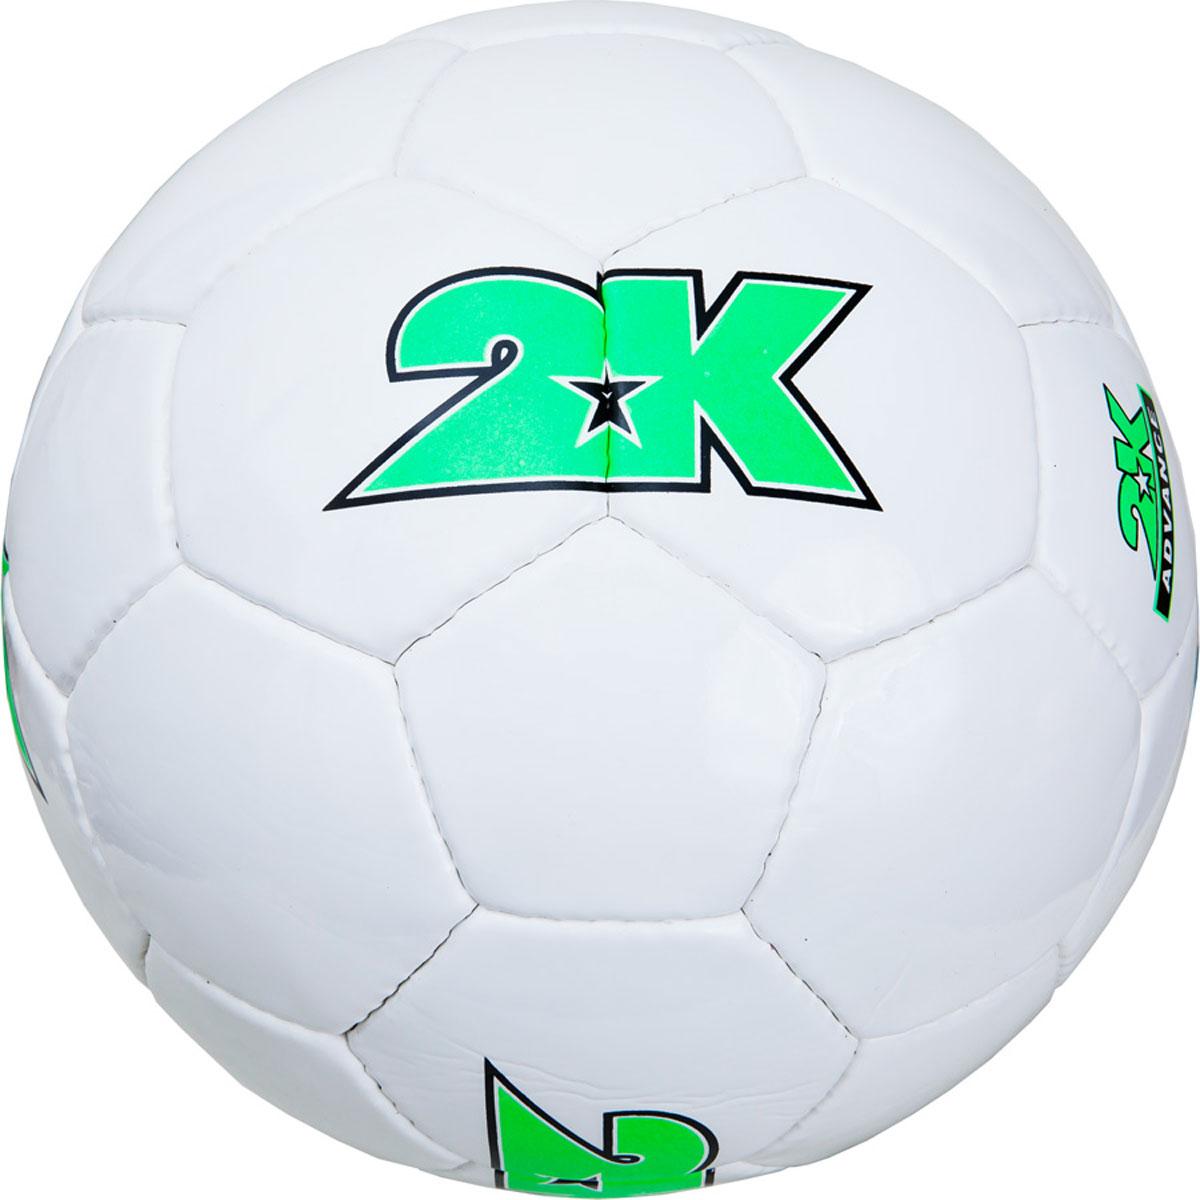 Мяч футбольный 2K Sport Advance, цвет: белый, зеленый. 127048. Размер 5